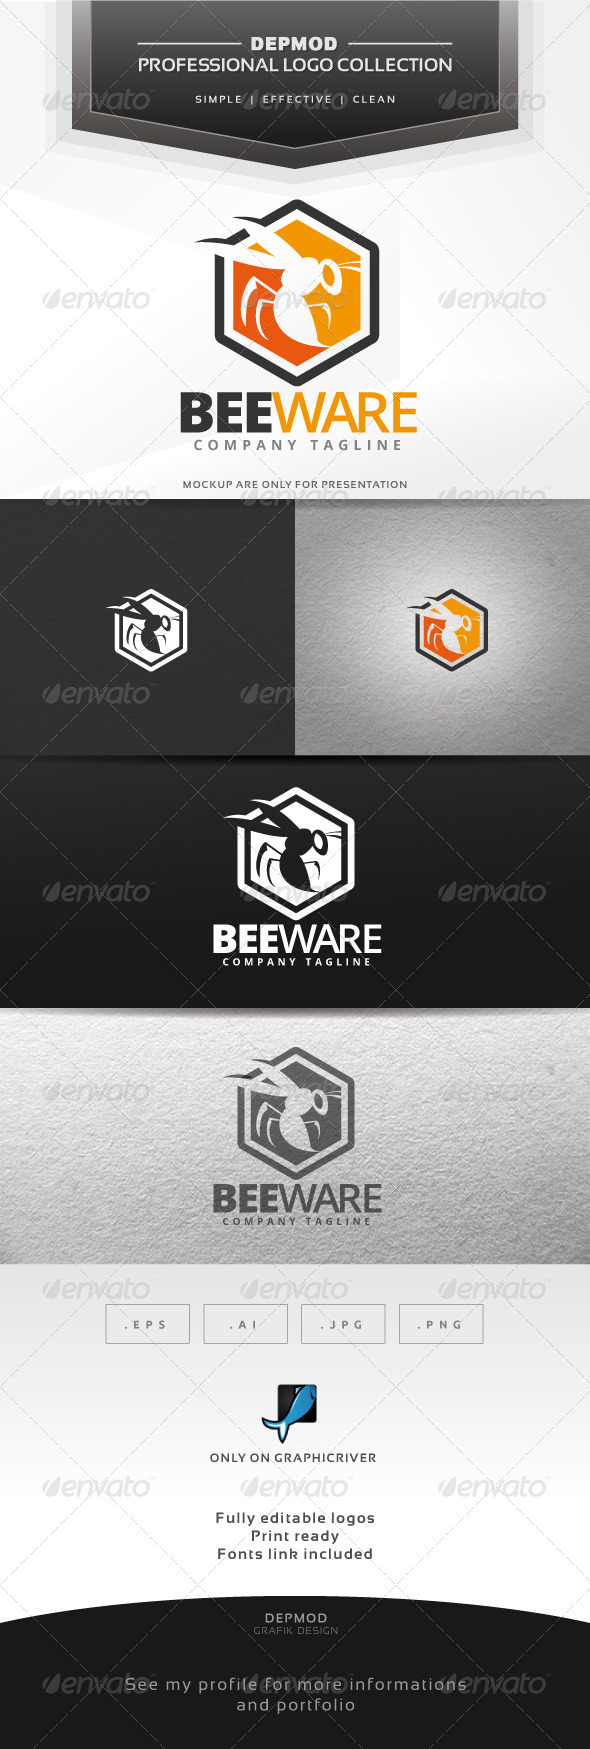 GraphicRiver Beeware Logo 6836755